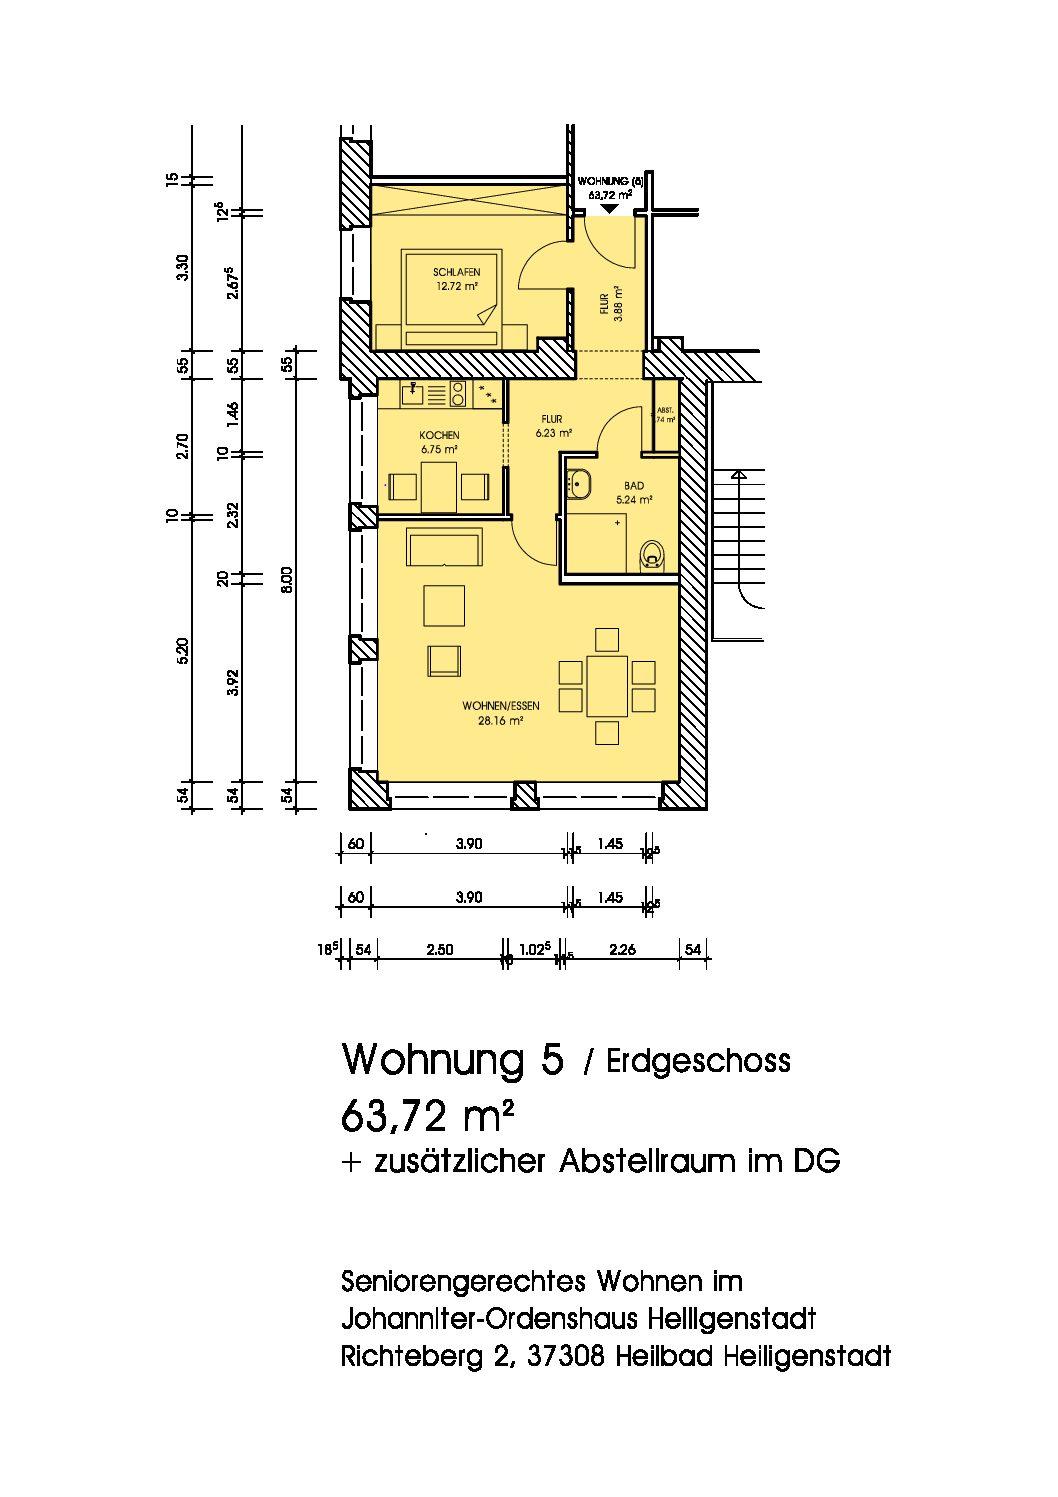 HIG-Wohnung_5